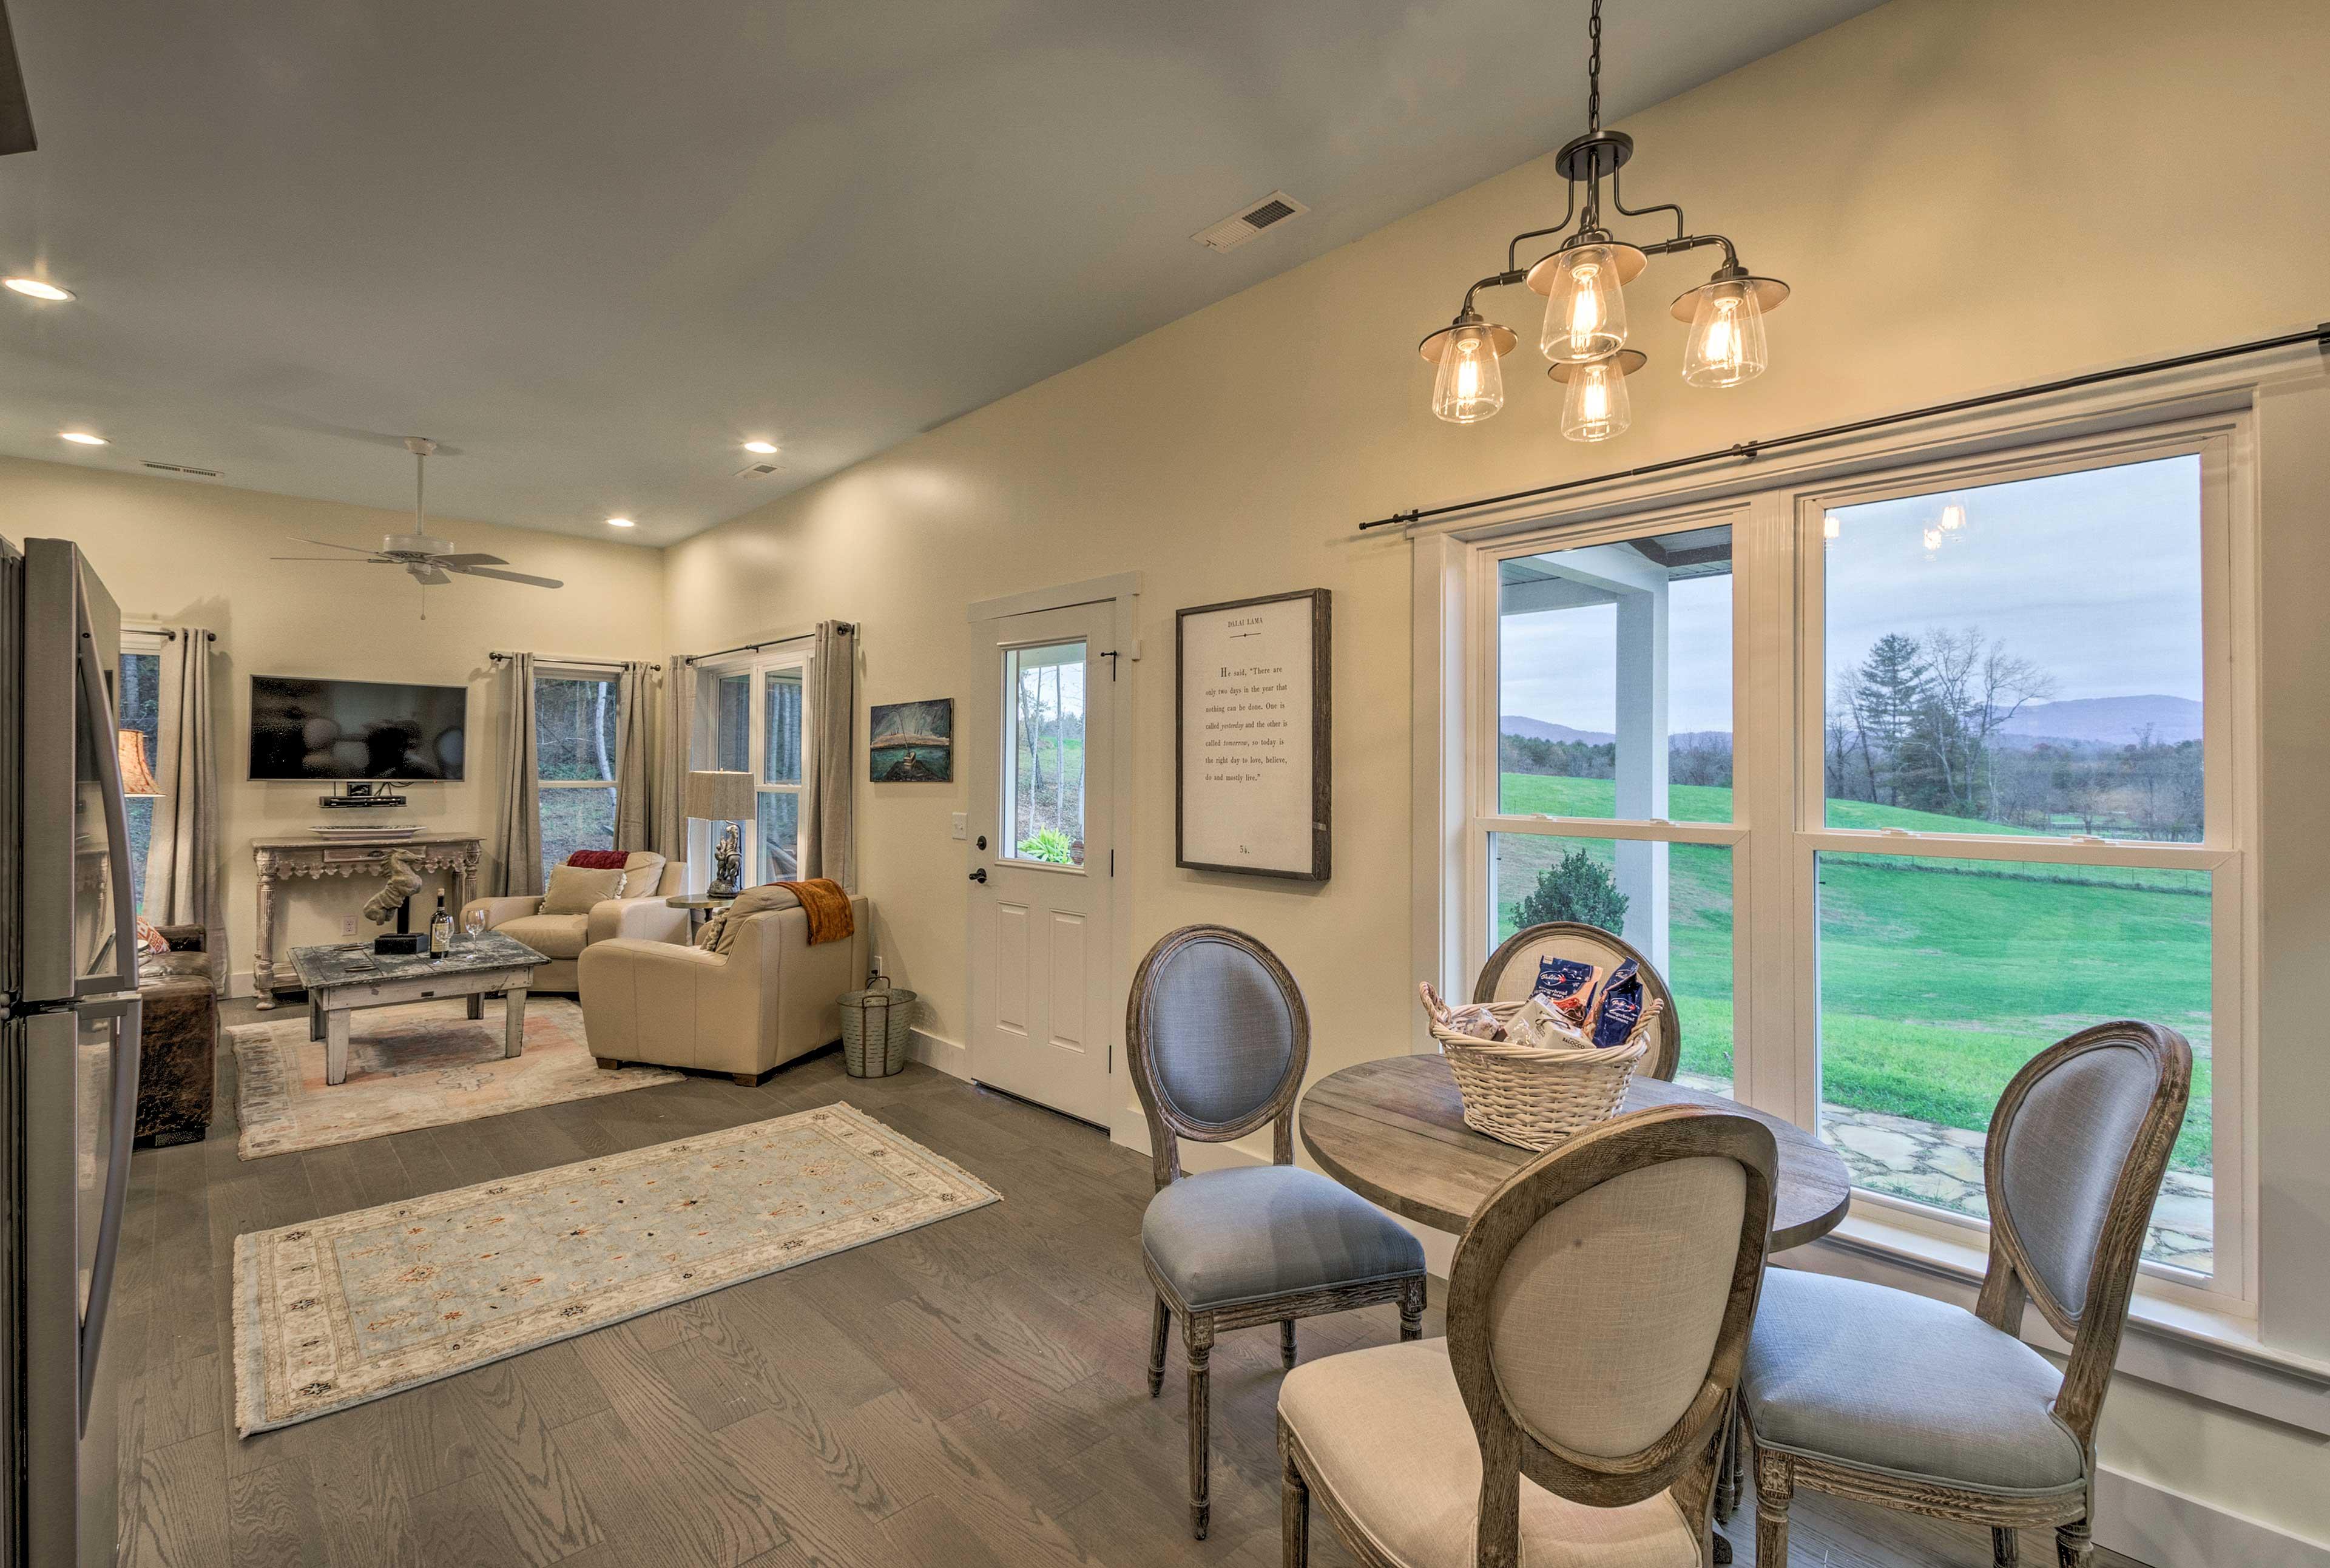 Natural light illuminates the home through a wealth of windows.